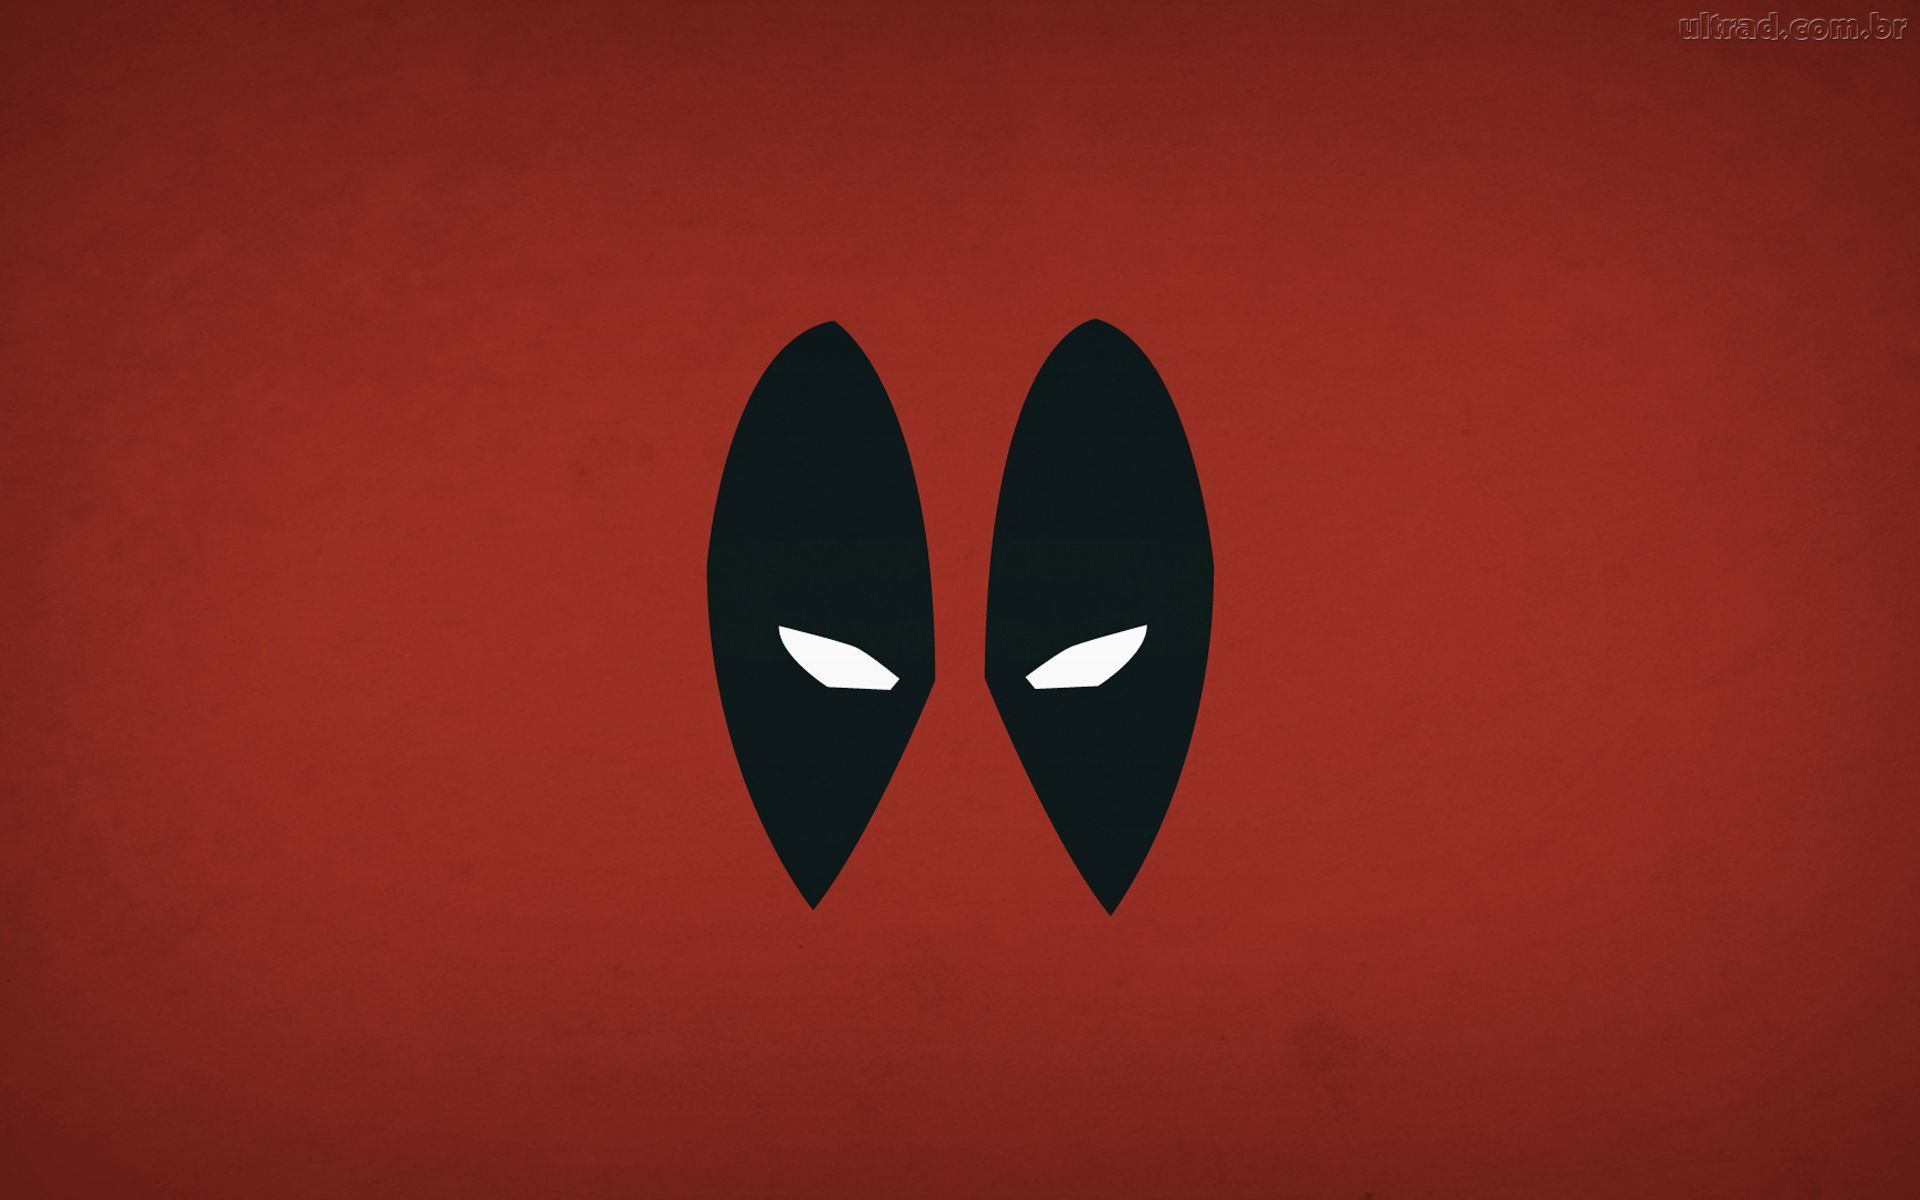 ideas about Deadpool Wallpaper on Pinterest Deadpool 900—1166